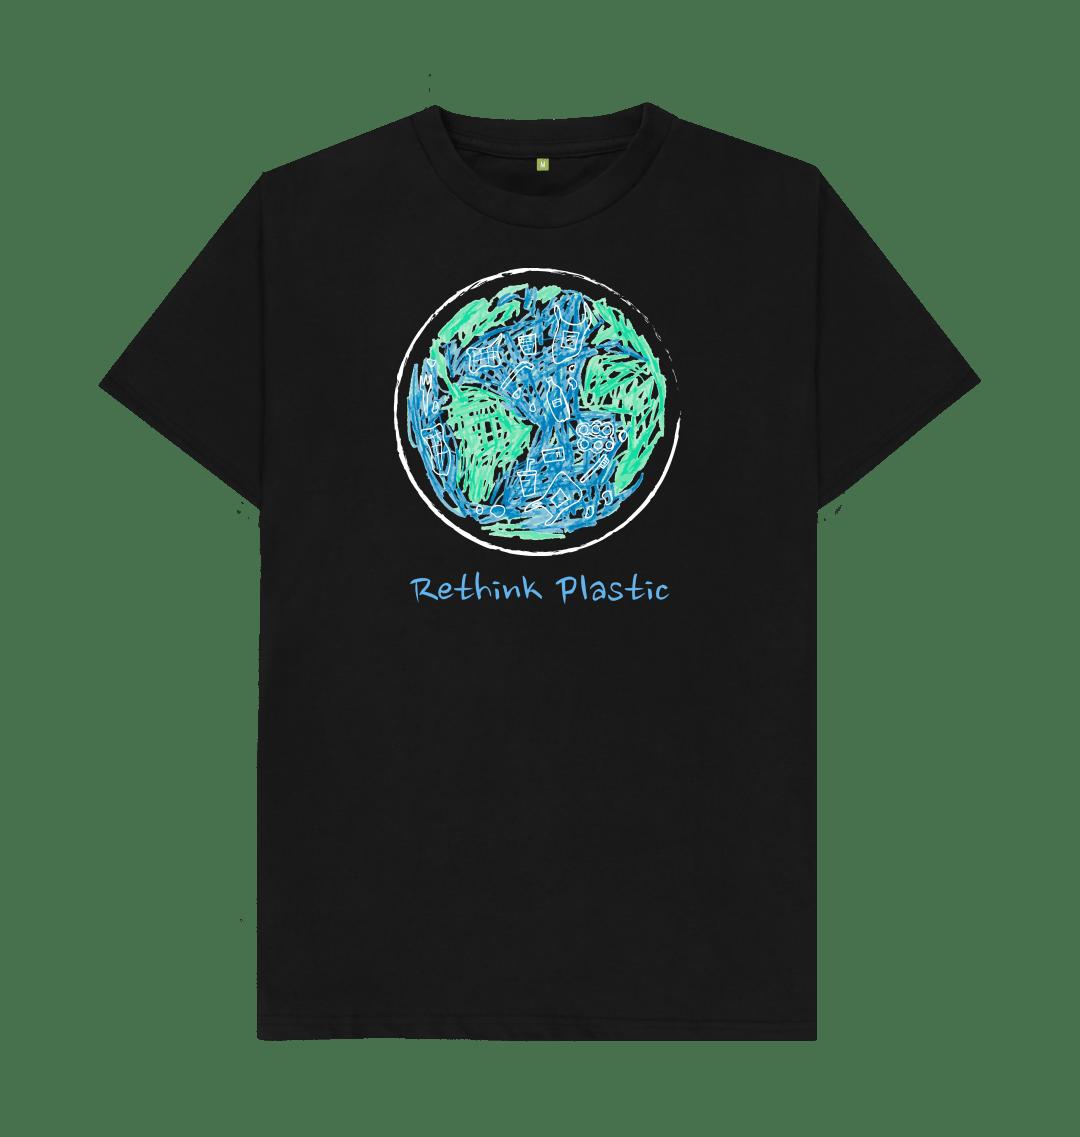 RETHINK PLASTIC Mens Eco Friendly T-shirt Top - Organic Cotton, Vegan